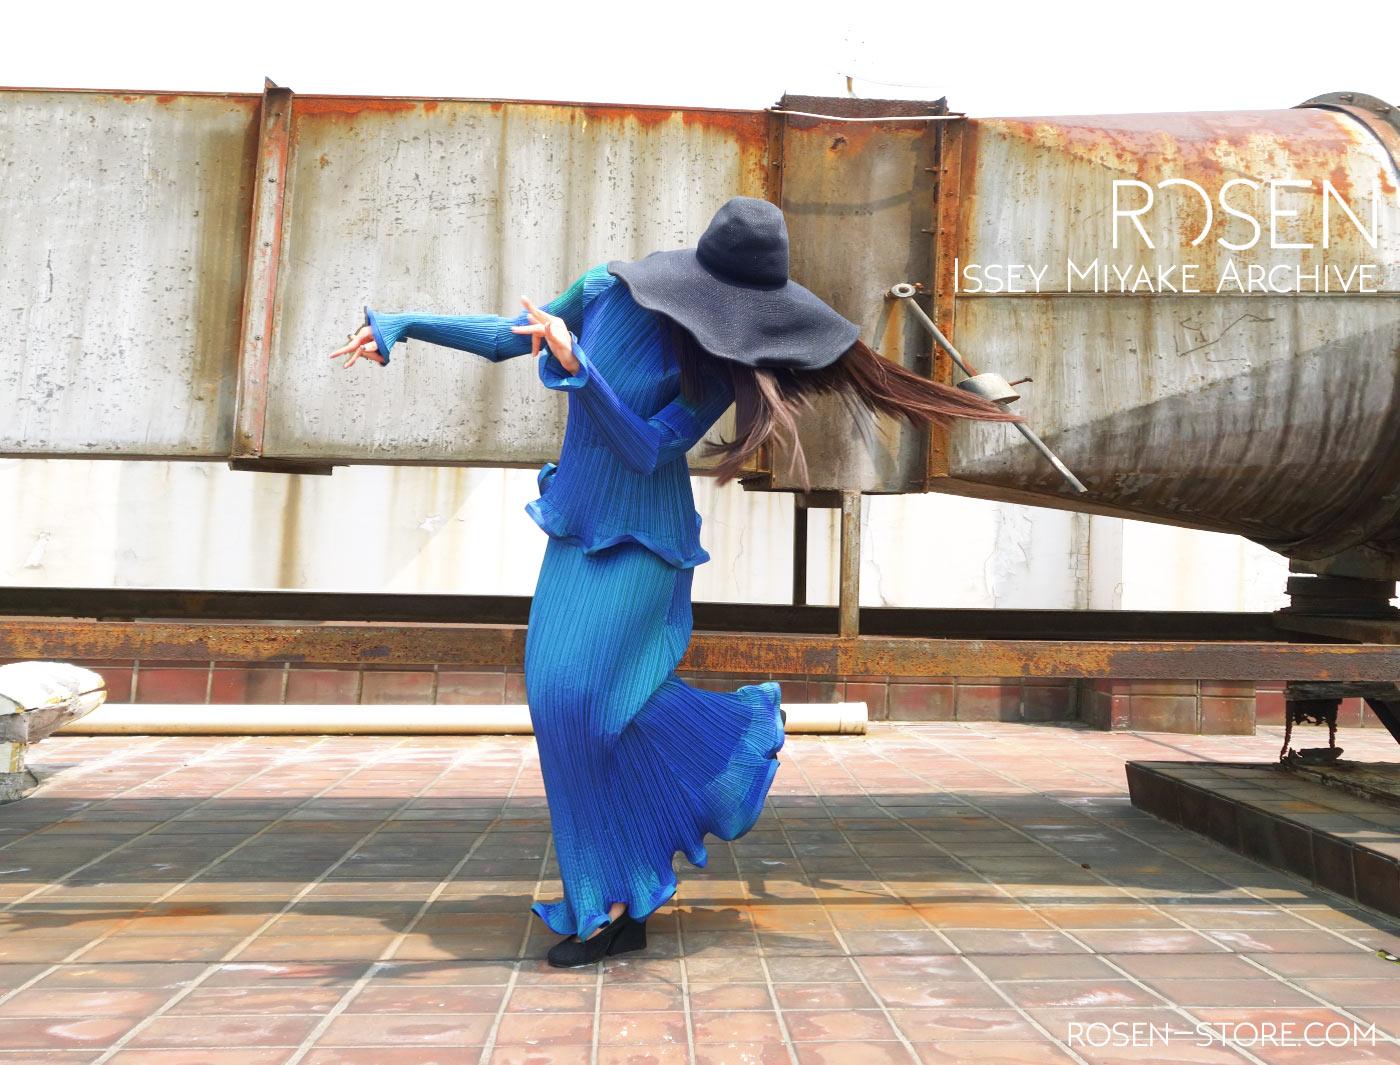 Issey Miyake on ROSEN